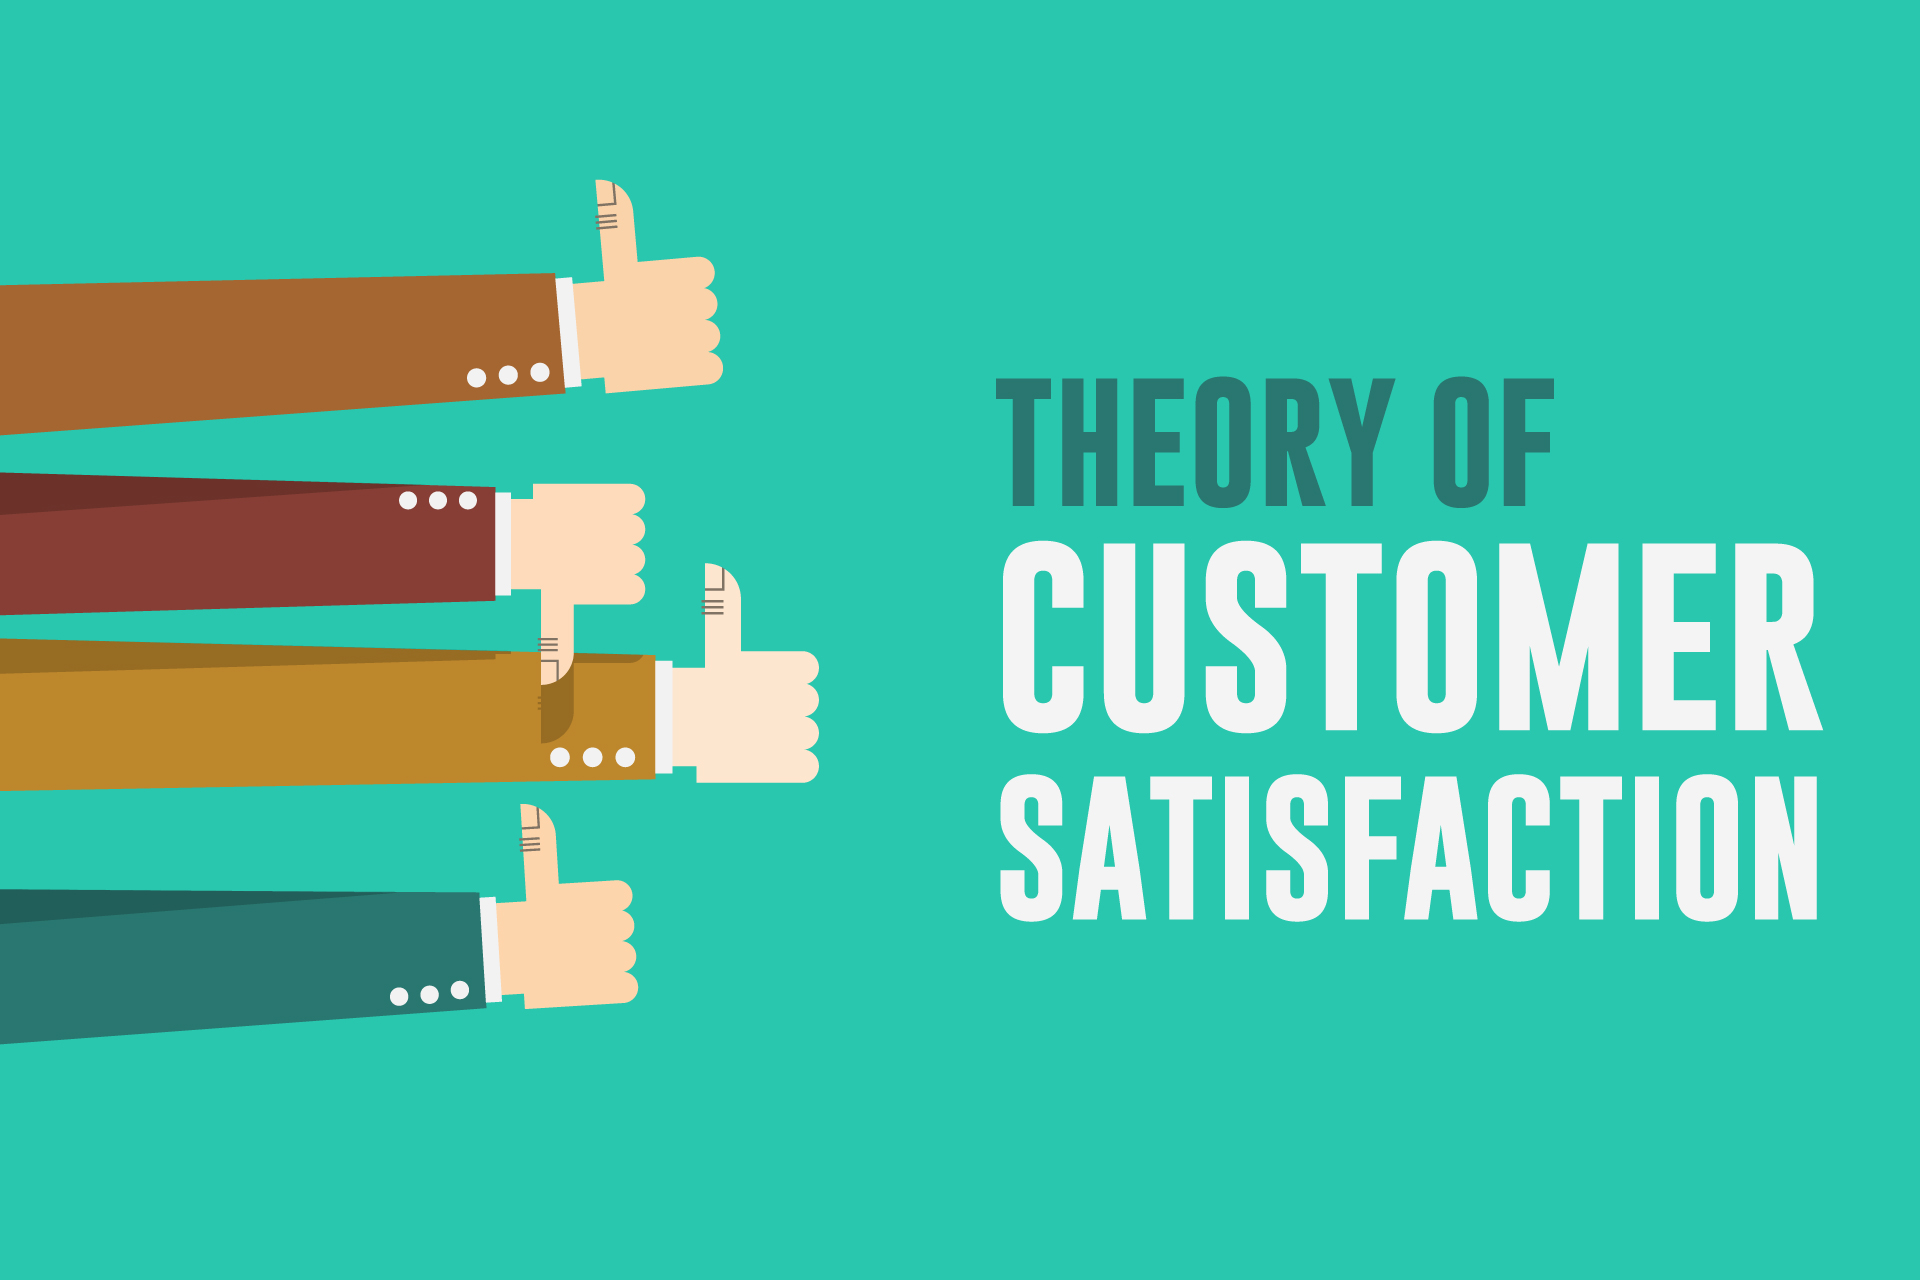 Theory of Customer Satisfaction